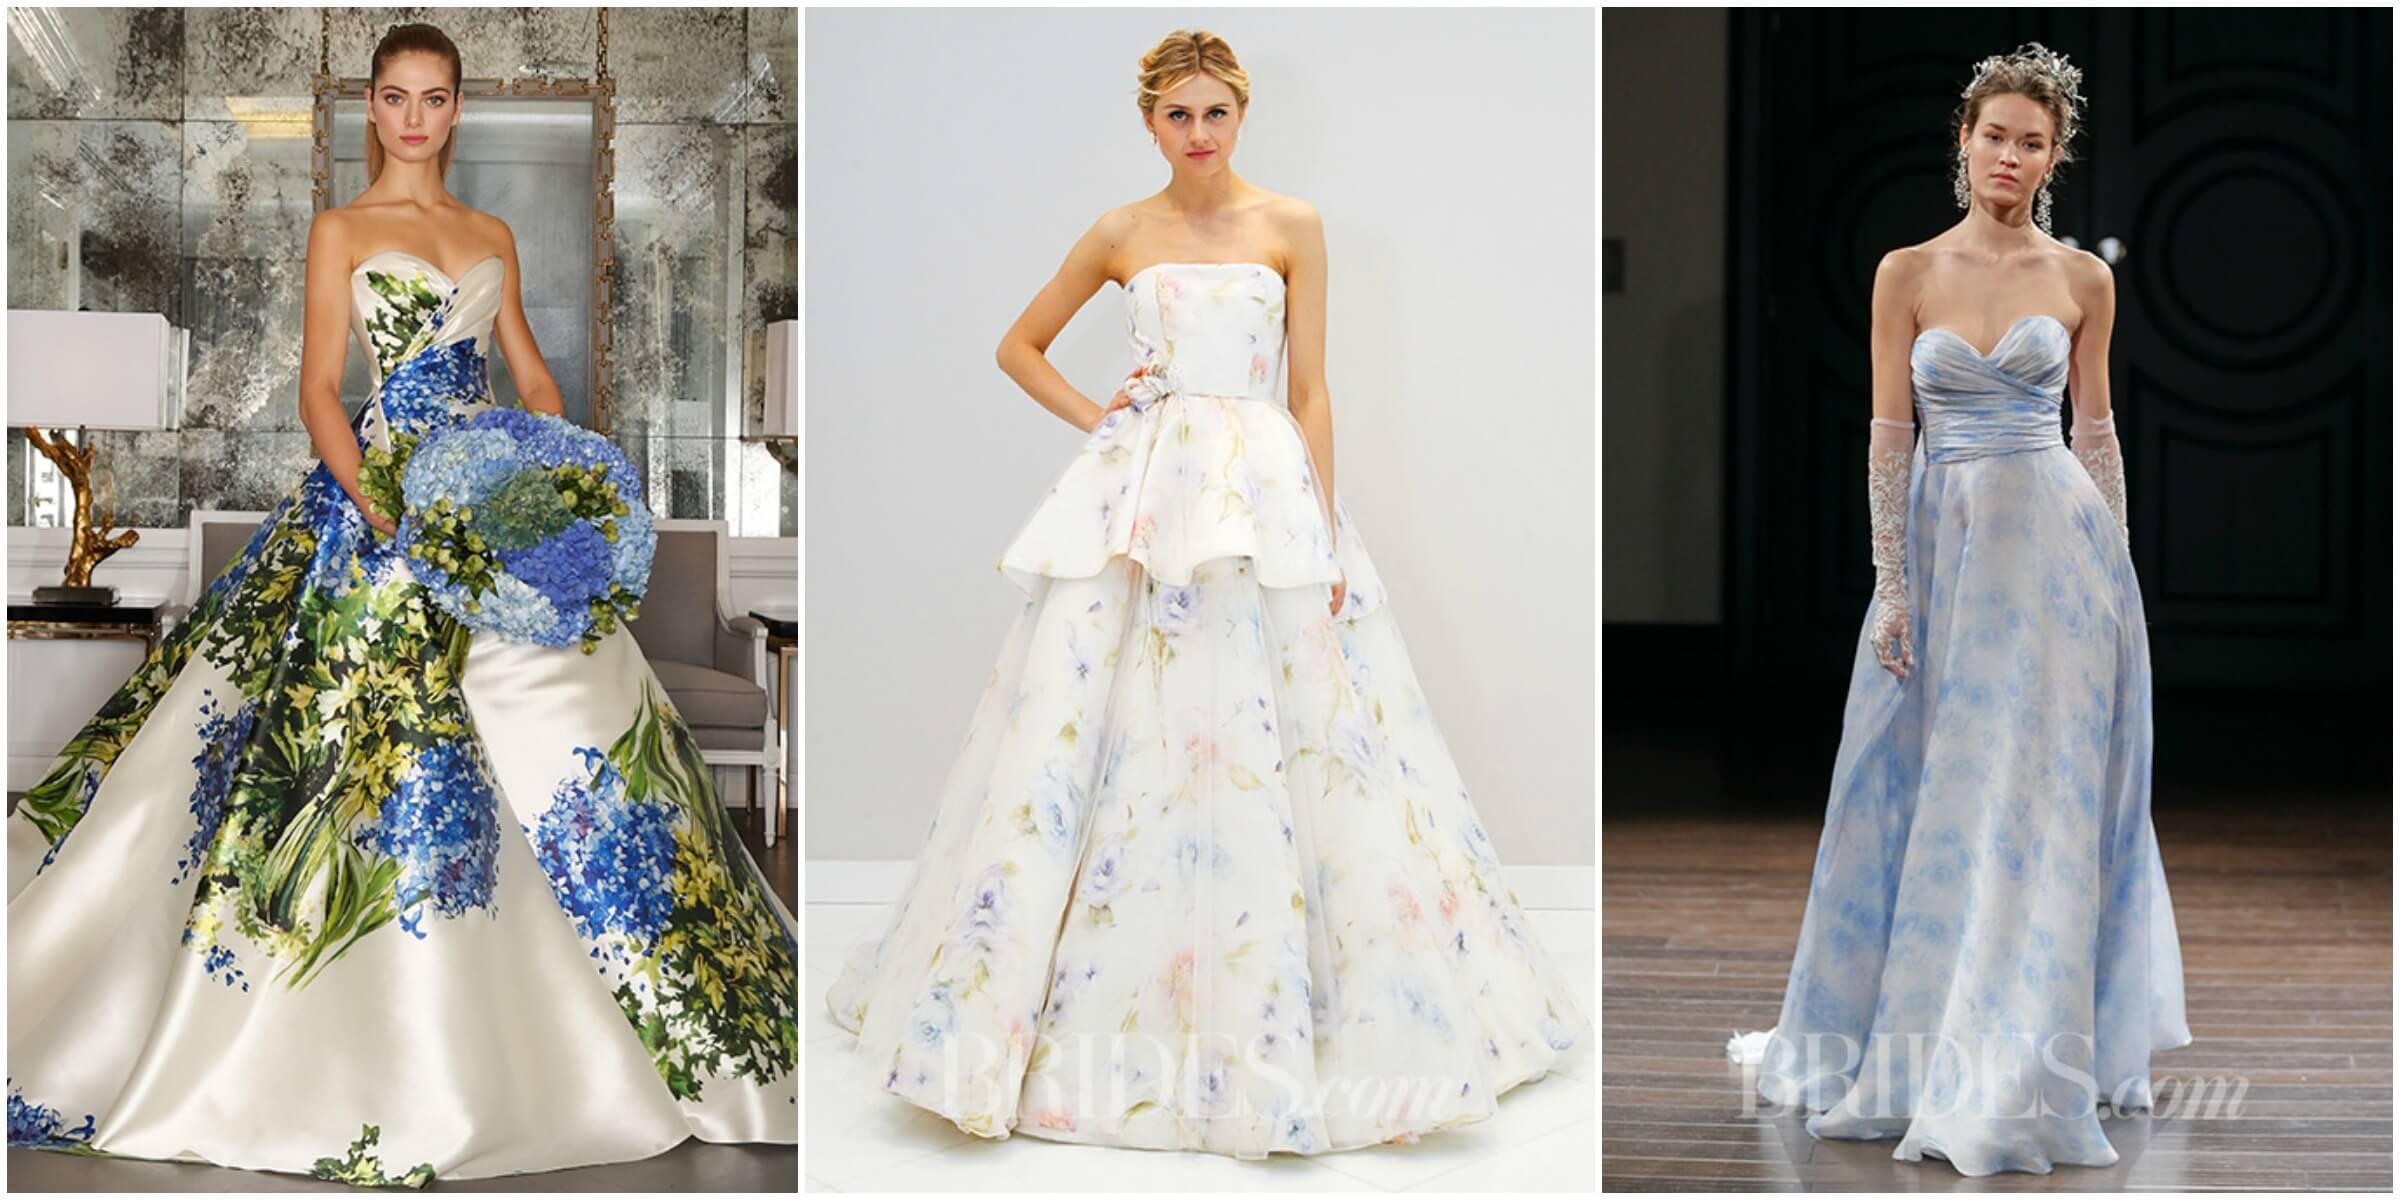 Romona Keveza Fall 2016 via Brides.com; Randi Rahm Spring 2016 via Brides.com; Naaem Khan Spring 2016 via Brides.com